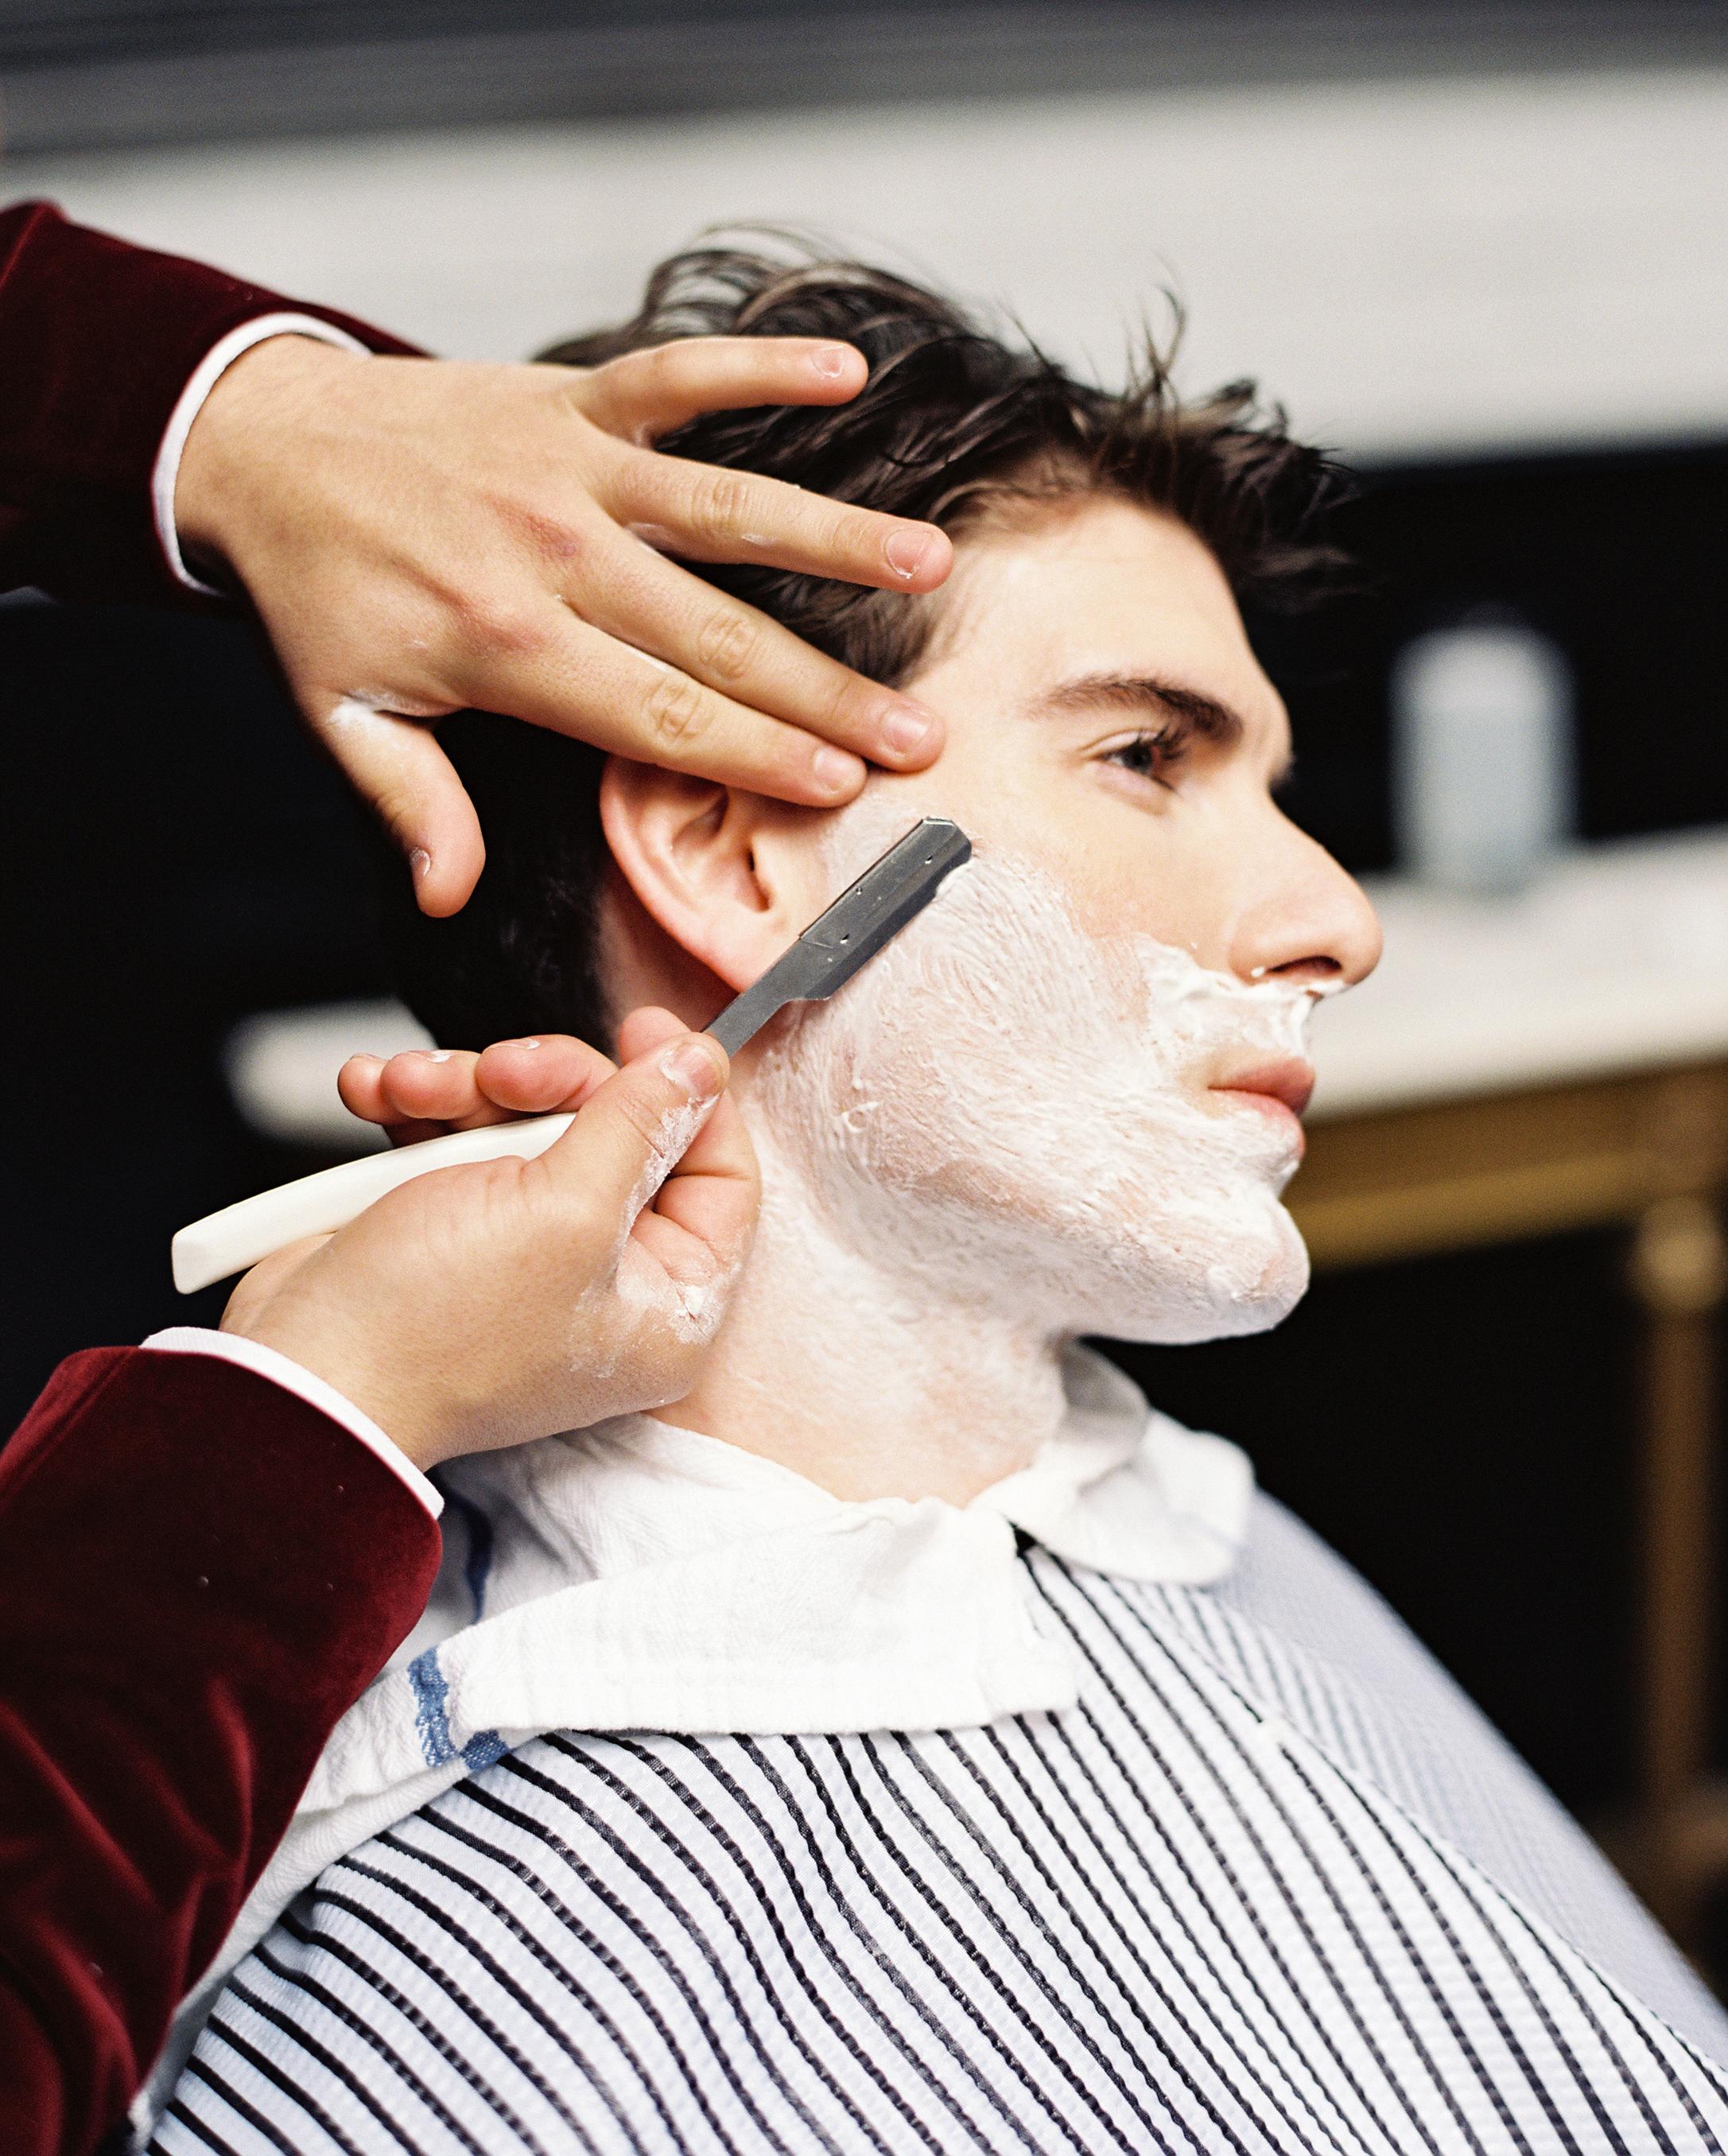 mens-getting-ready-guide-razor-0715.jpg